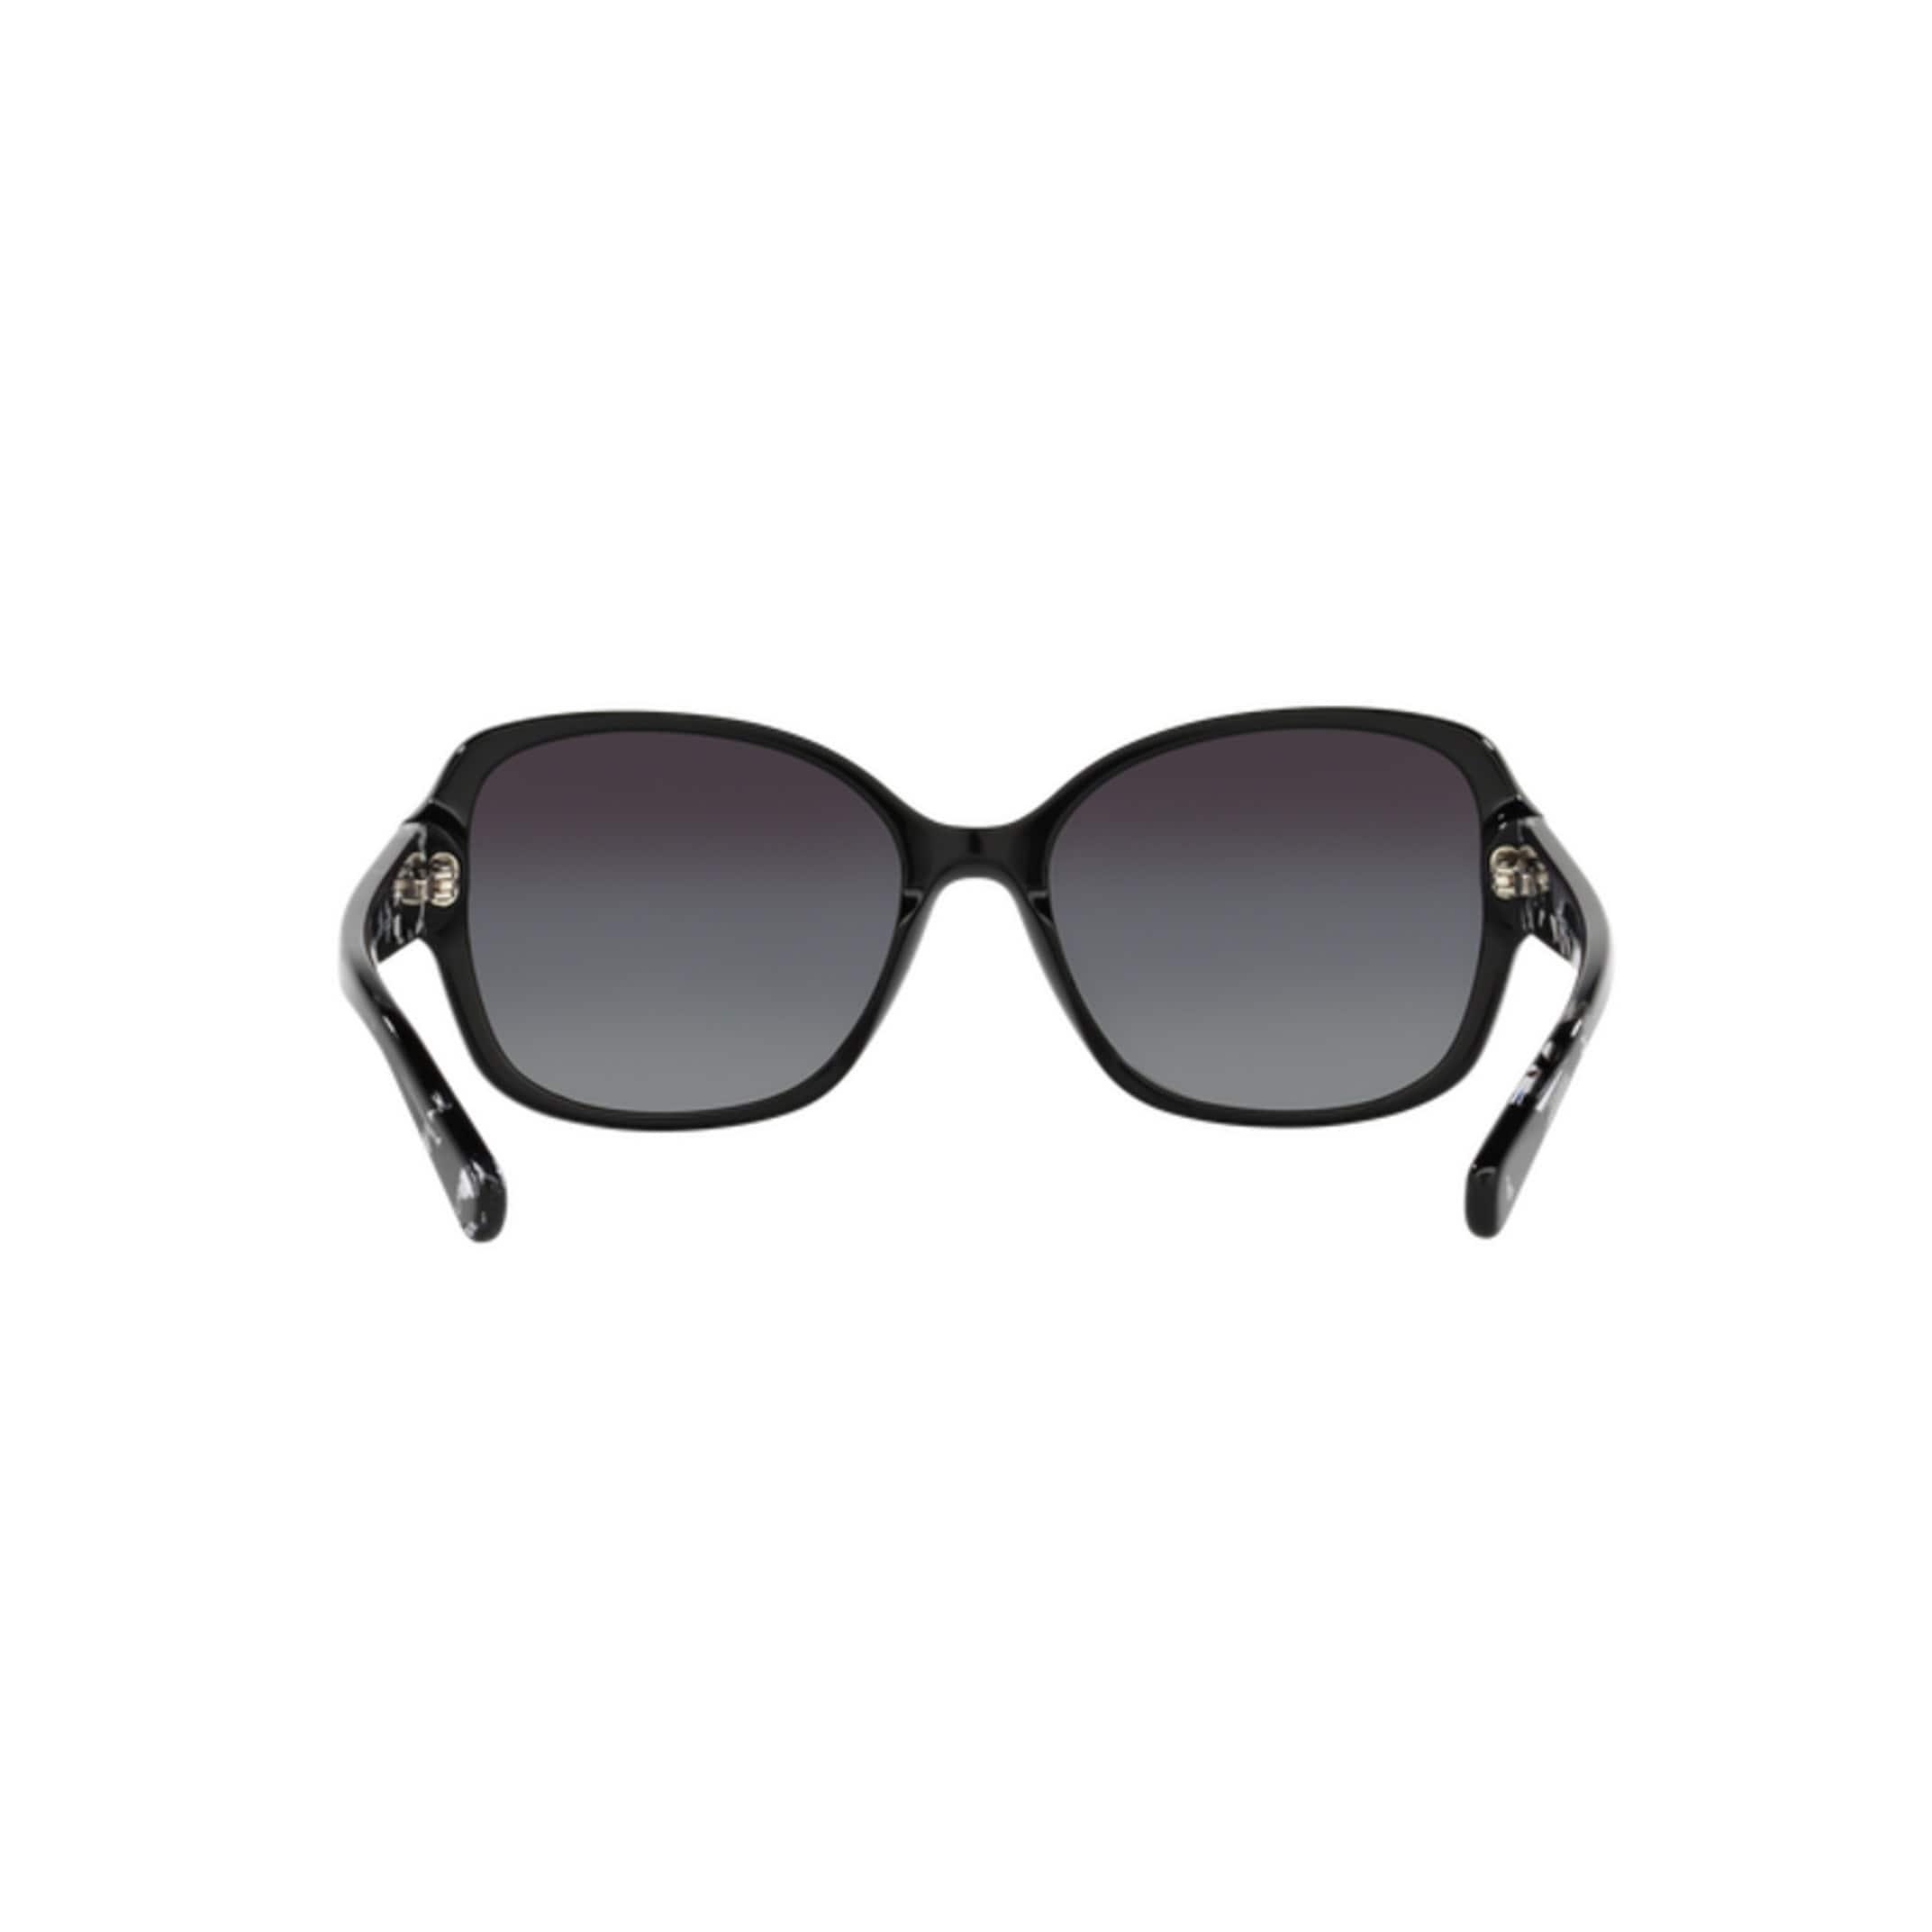 62e18caf8e italy coach hc8166 sunglasses flash preview 5eb2e fa50a  czech shop coach  hc8166f 534811 black black crystal mosaic womens plastic butterfly  sunglasses free ...